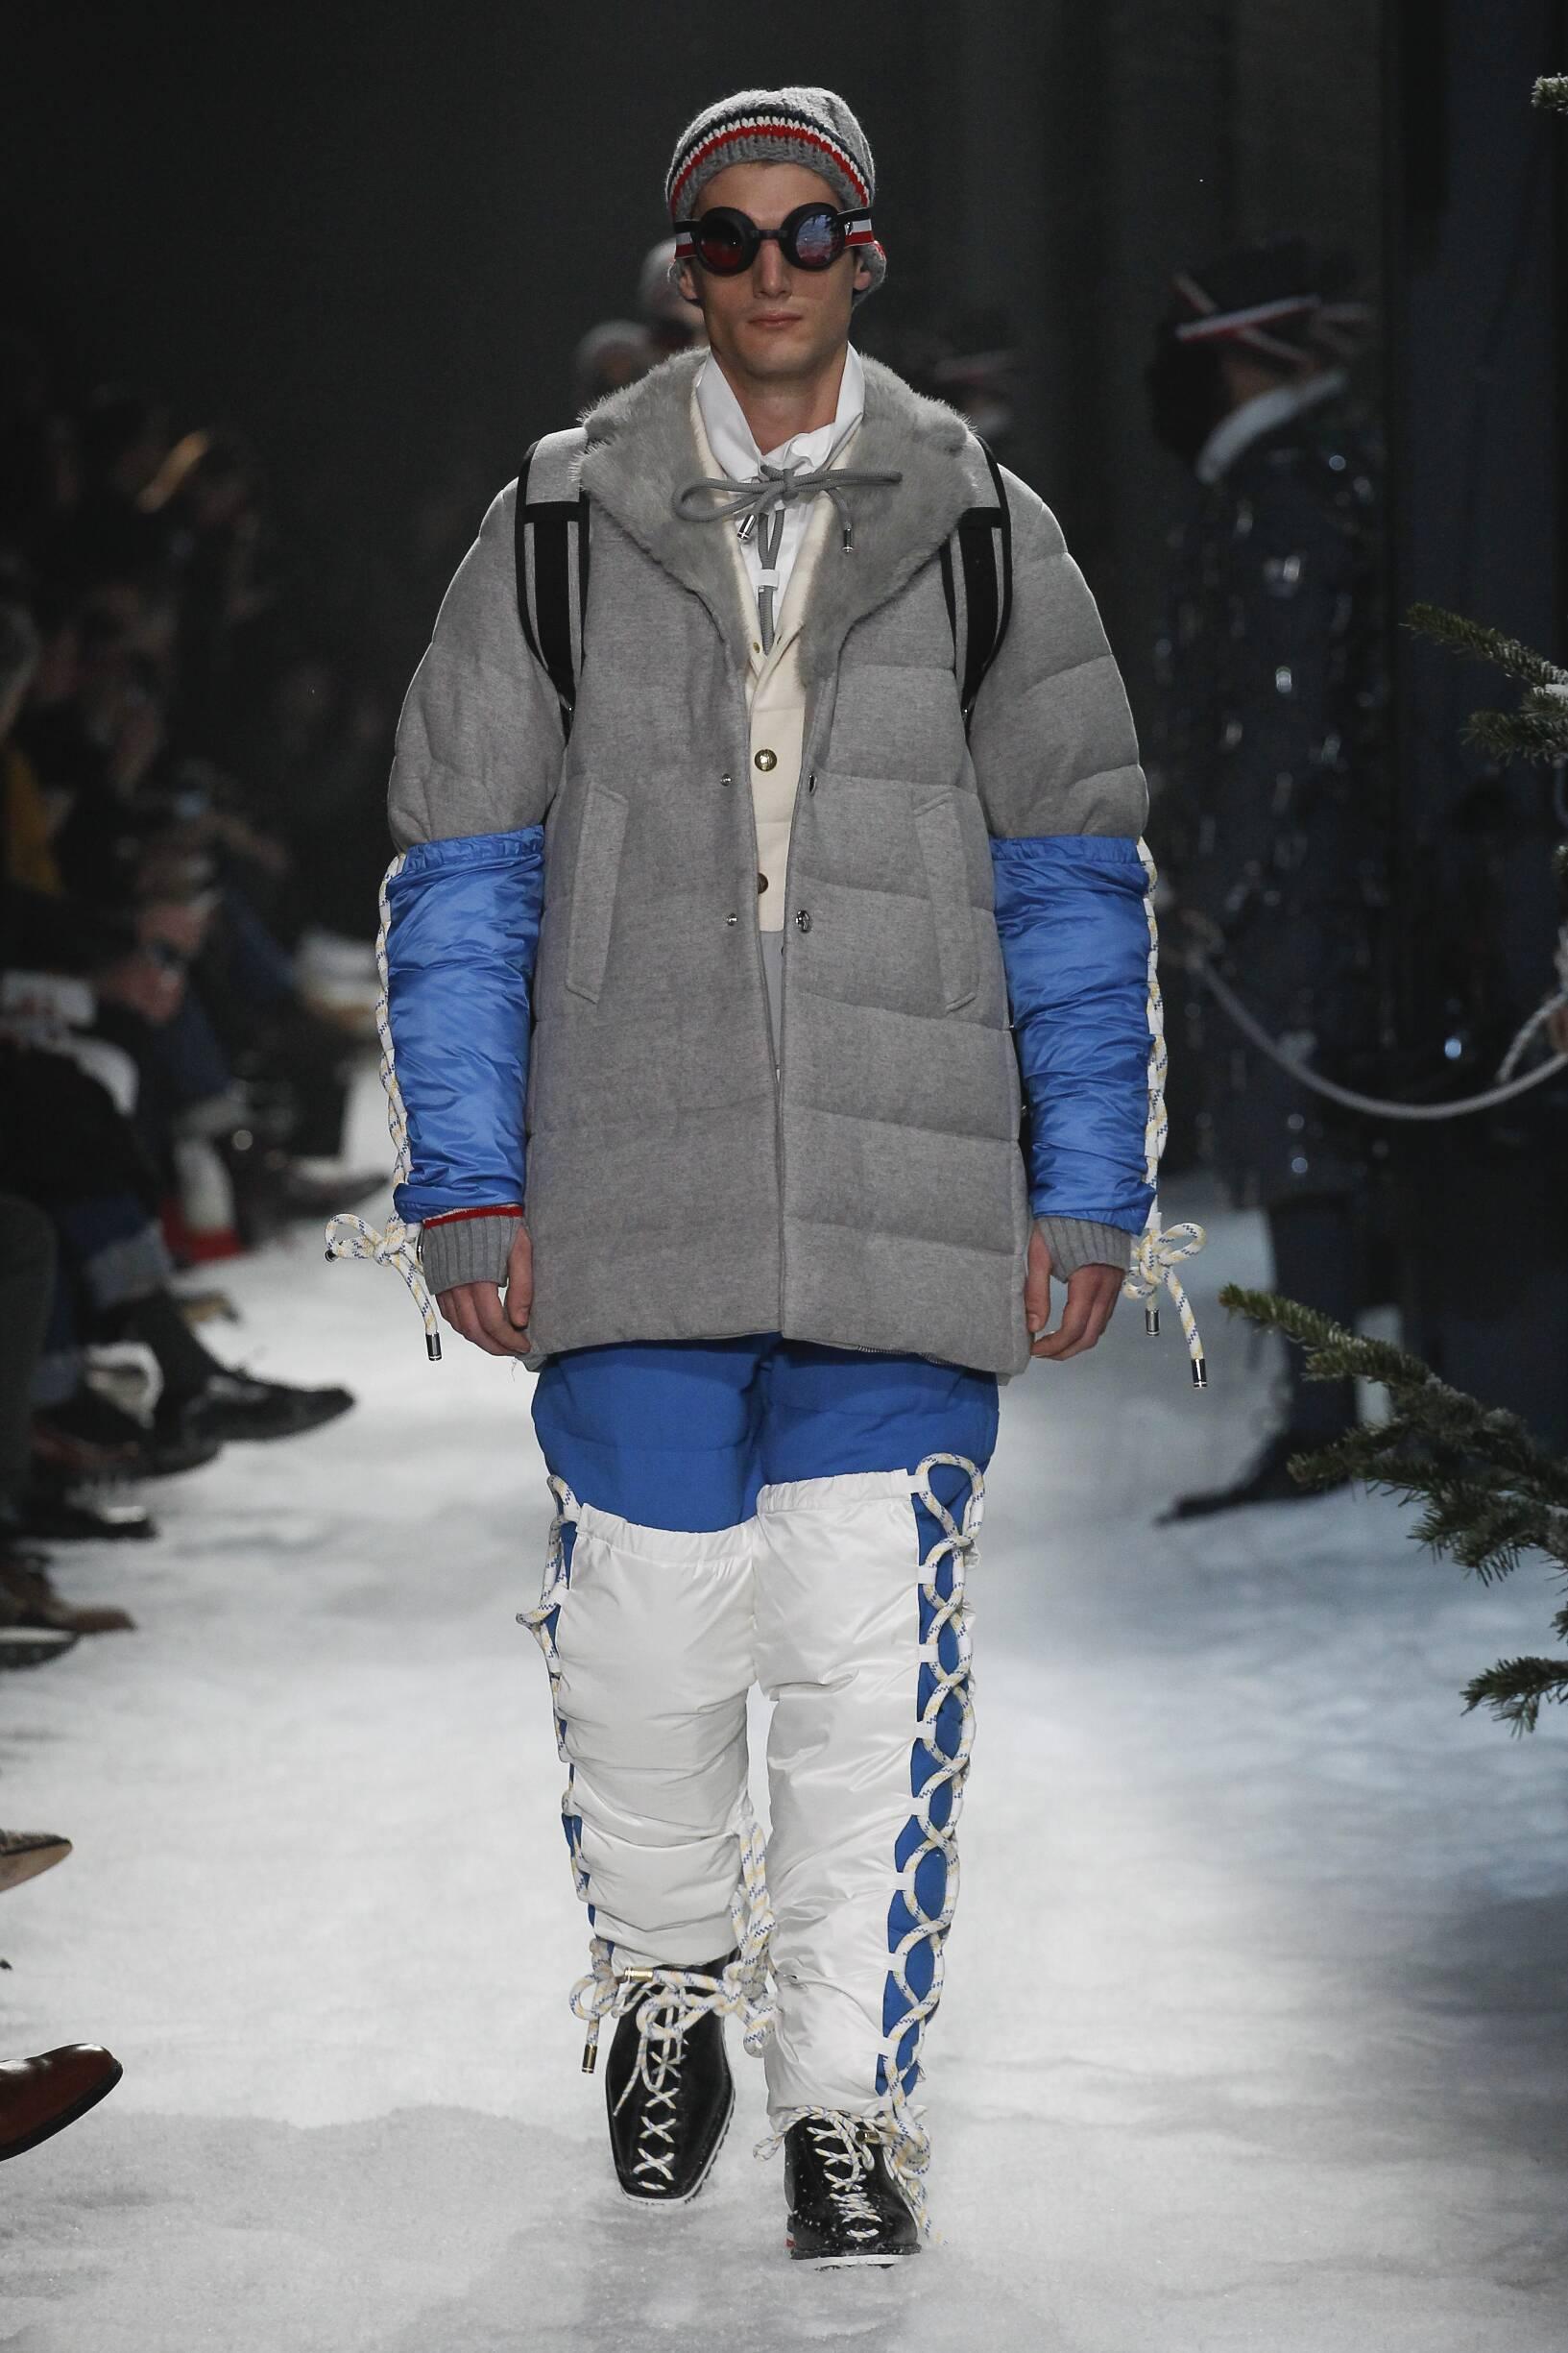 Moncler Gamme Bleu Fashion Show